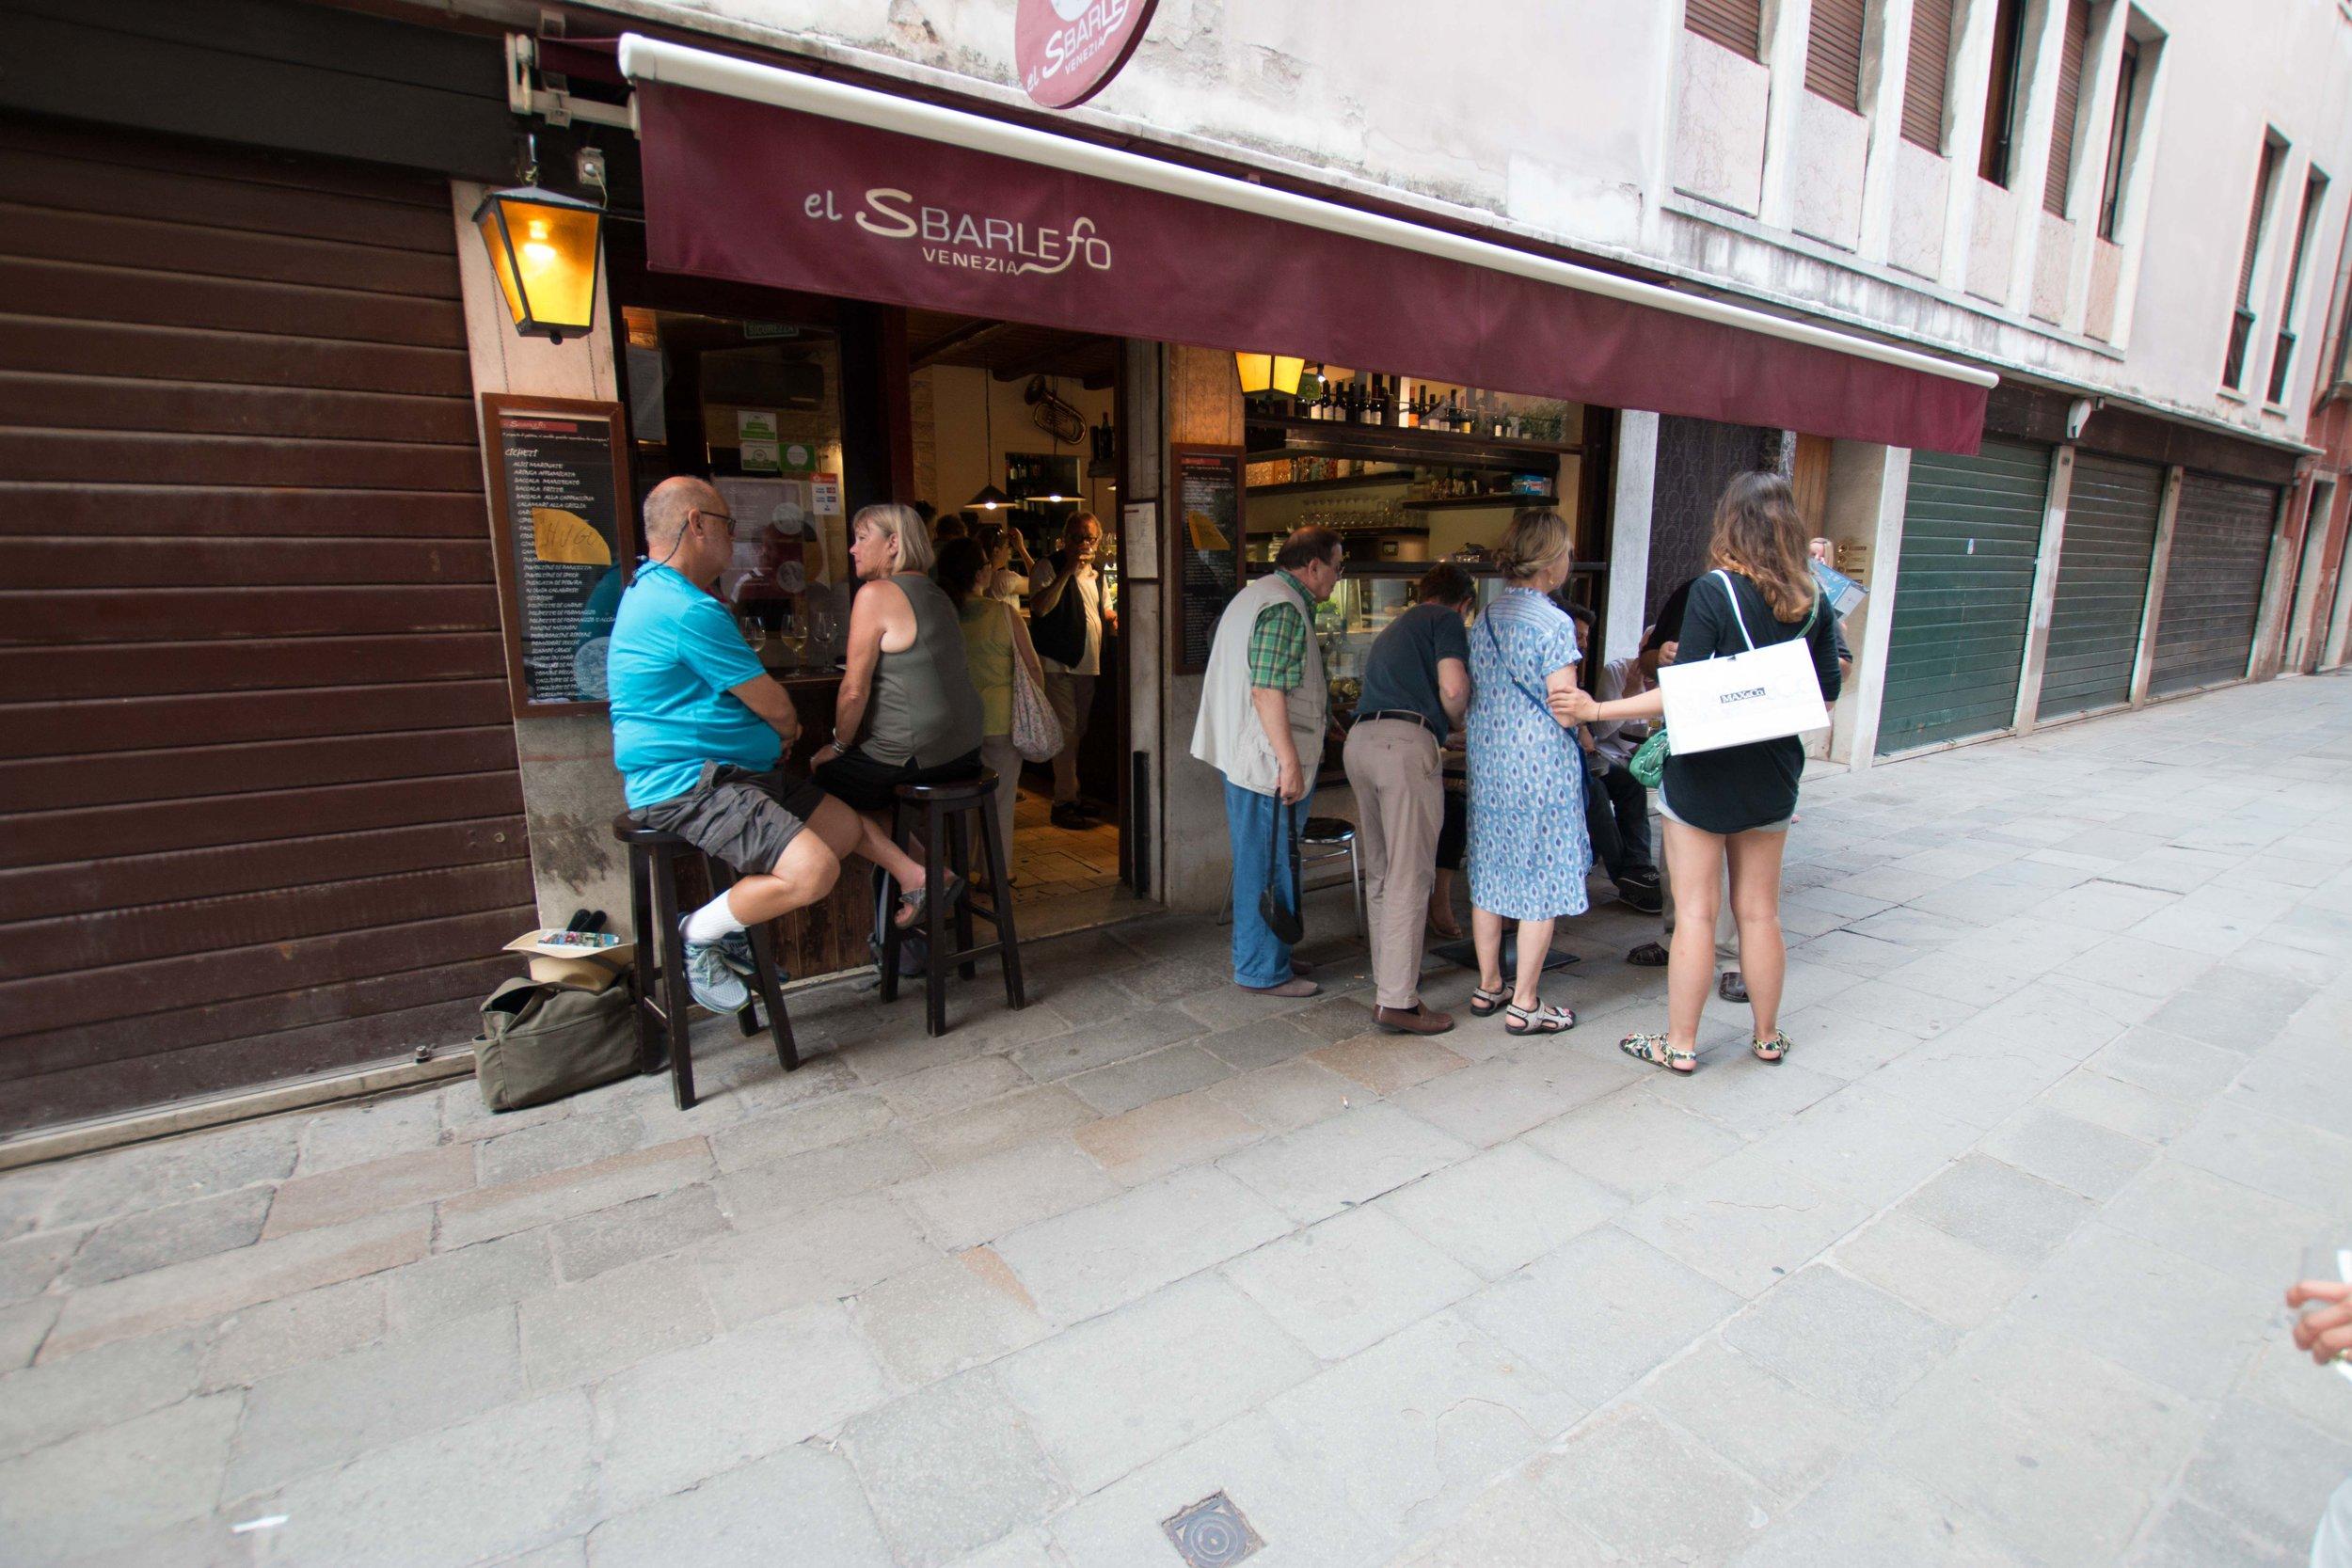 A wine and cicchetti bar in Venice